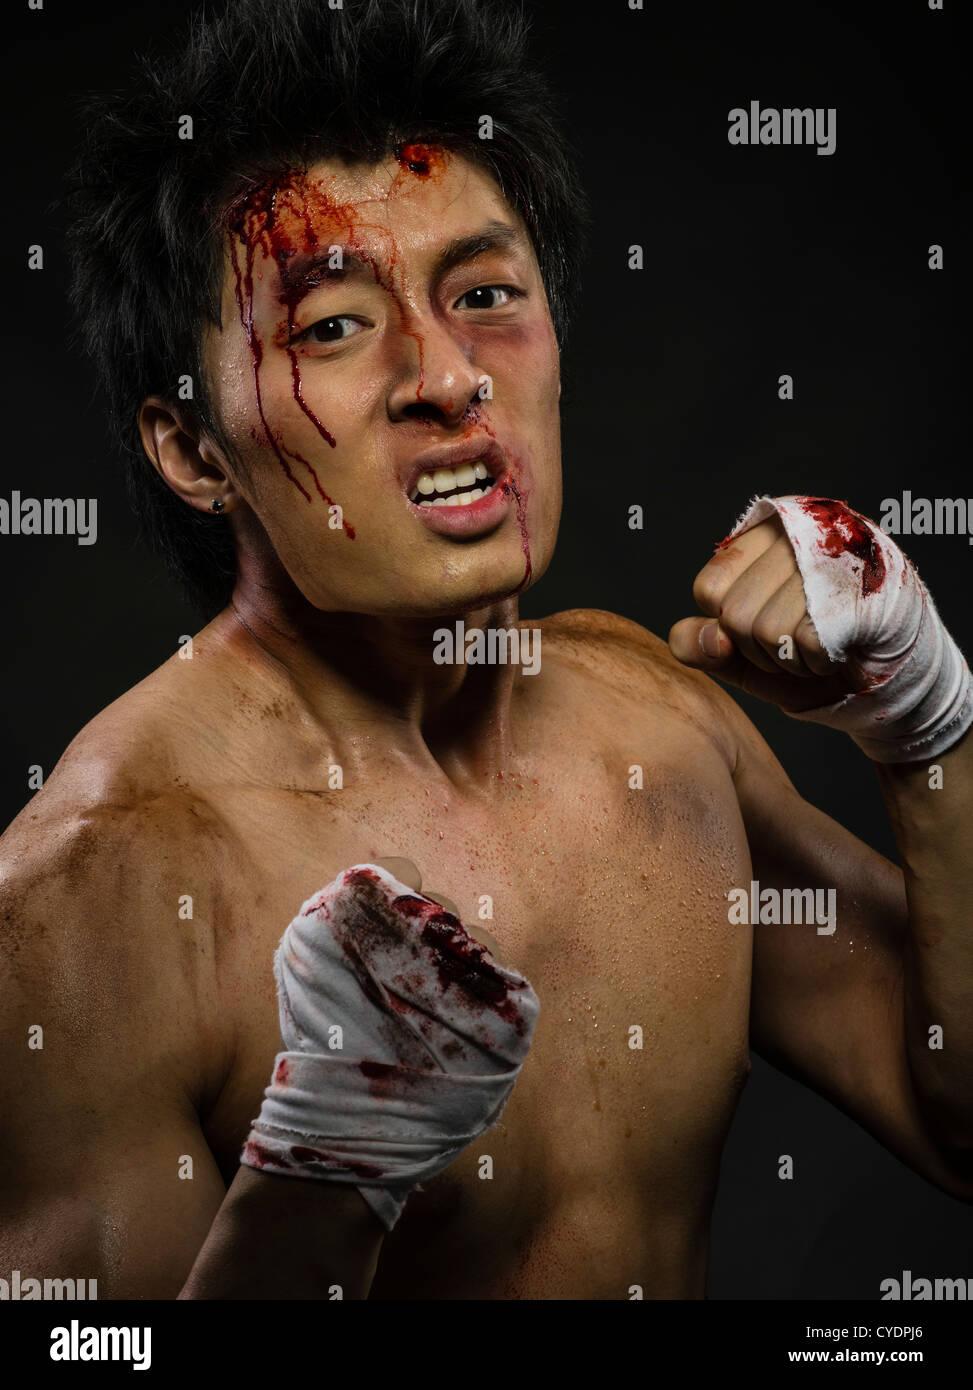 Street fighter  / bare-knuckle brawler - Stock Image